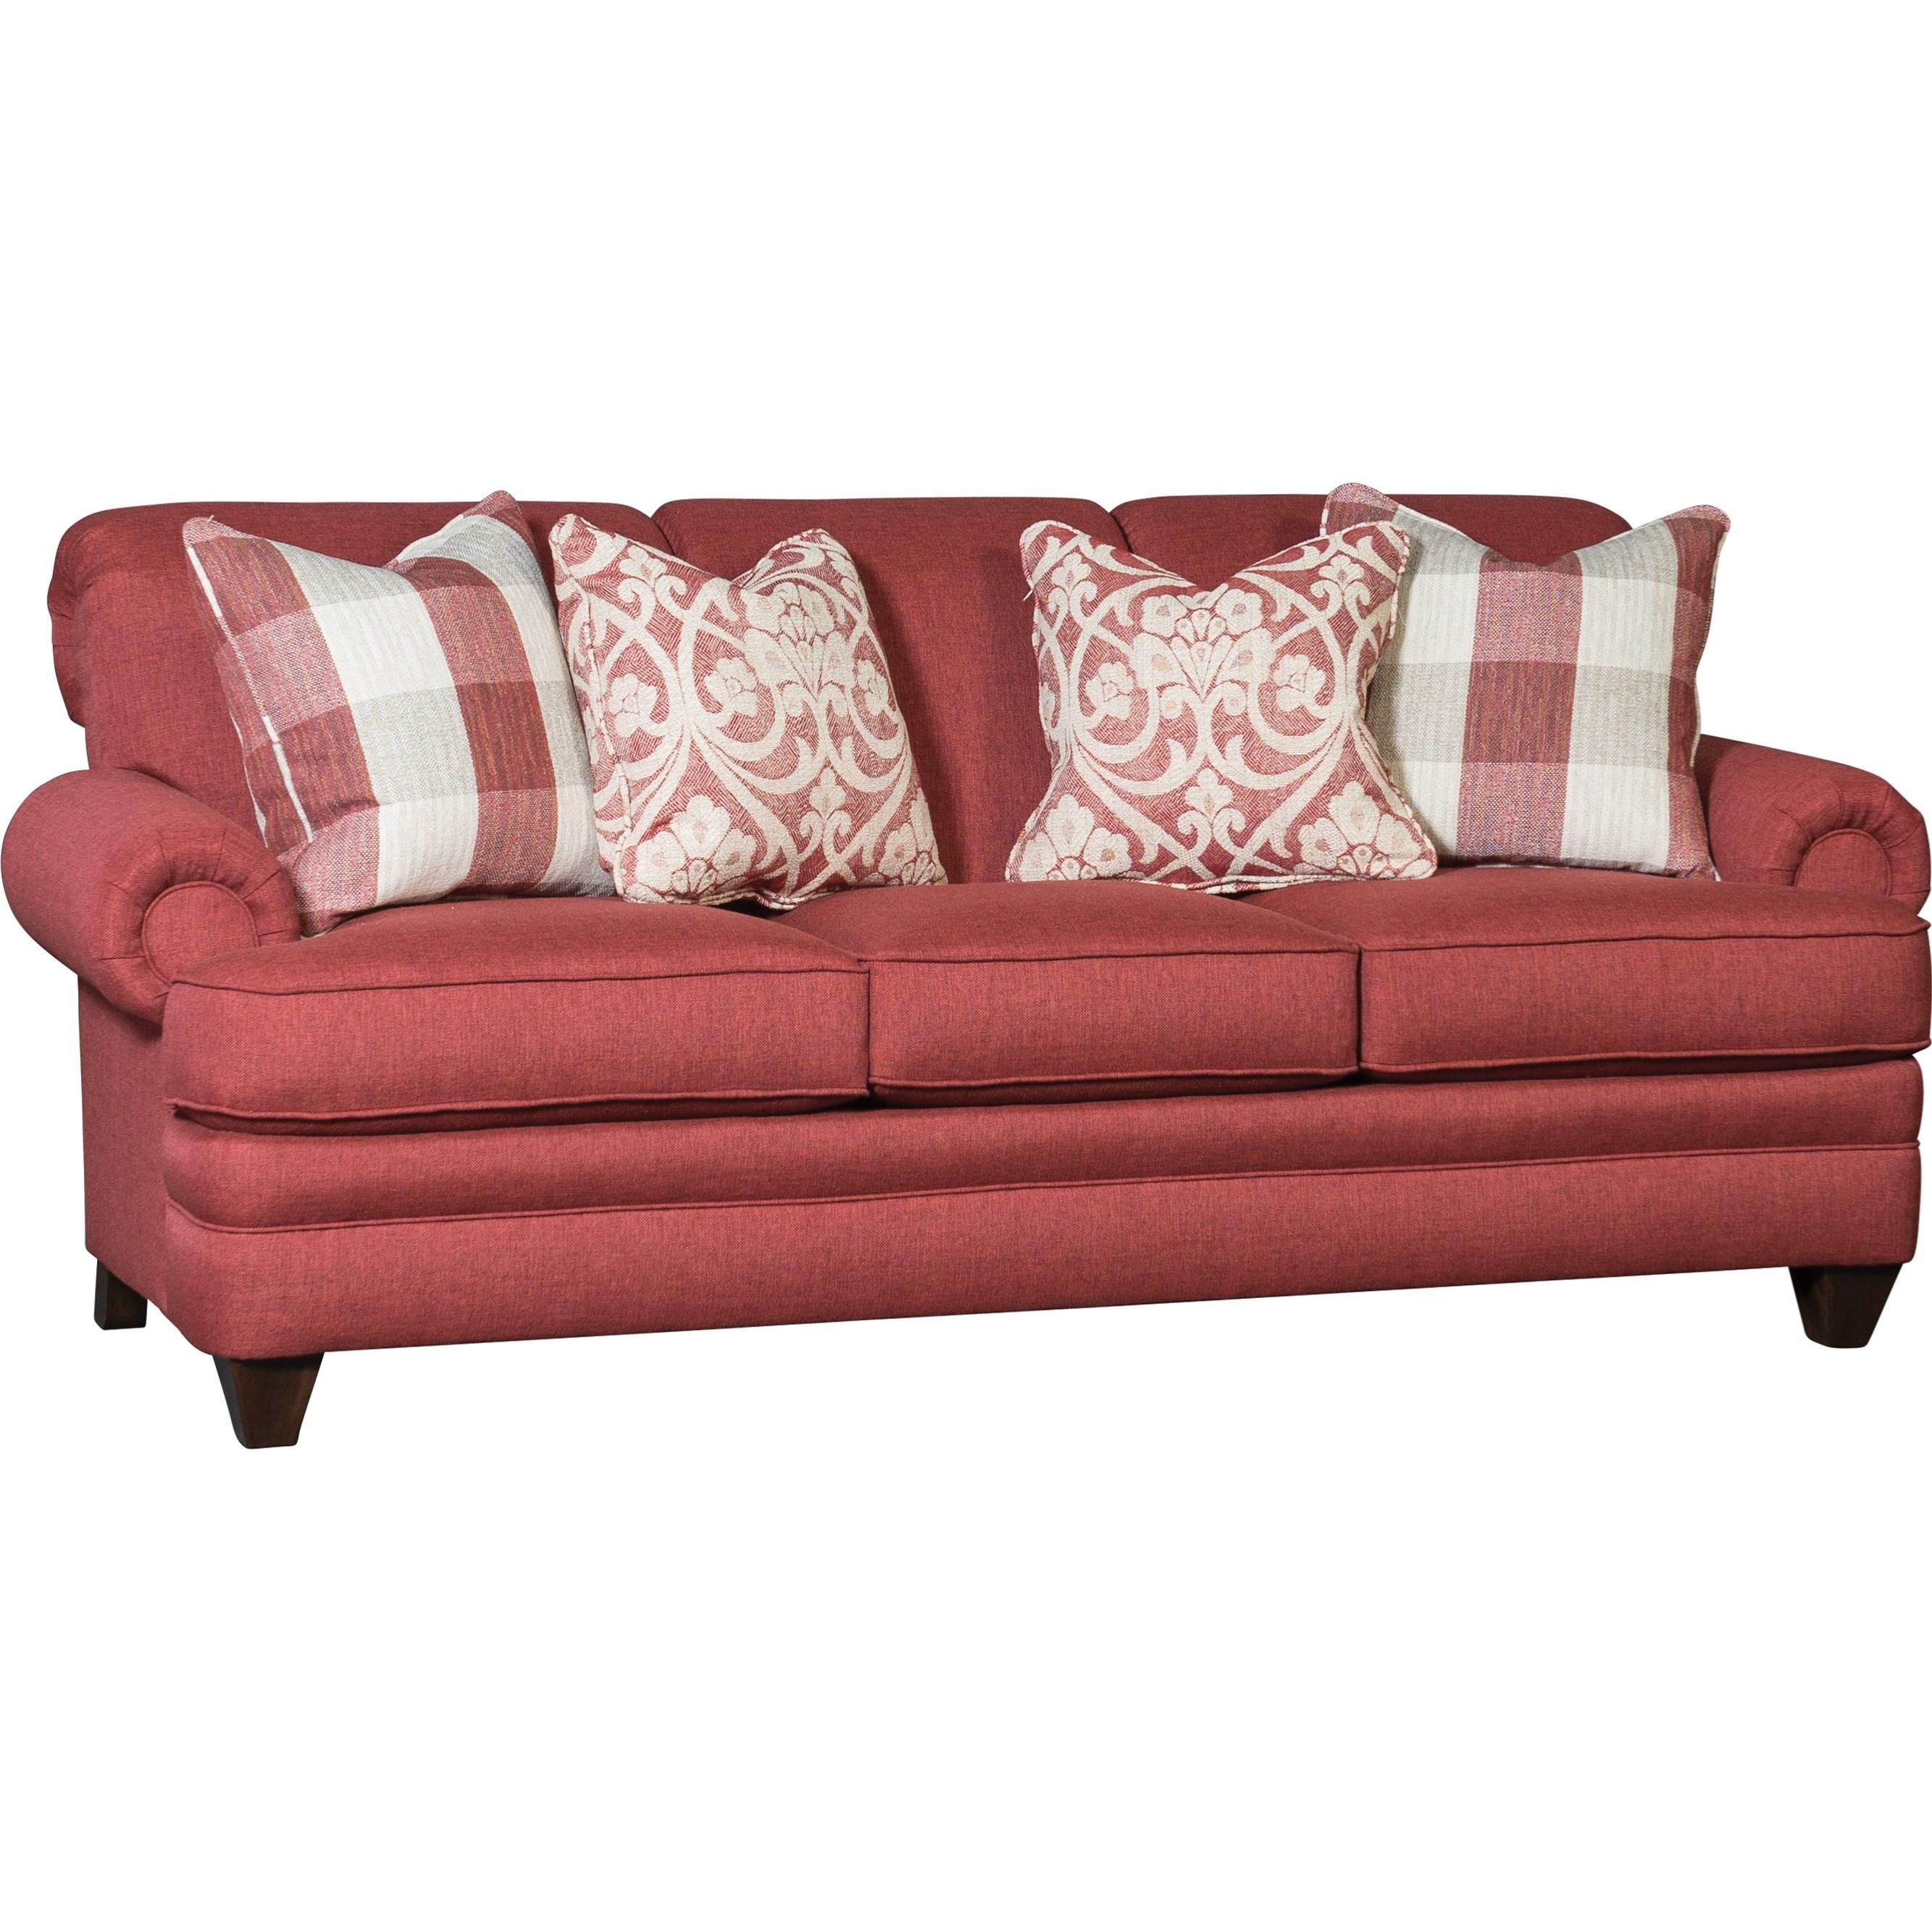 2377 Sofa by Mayo at Story & Lee Furniture